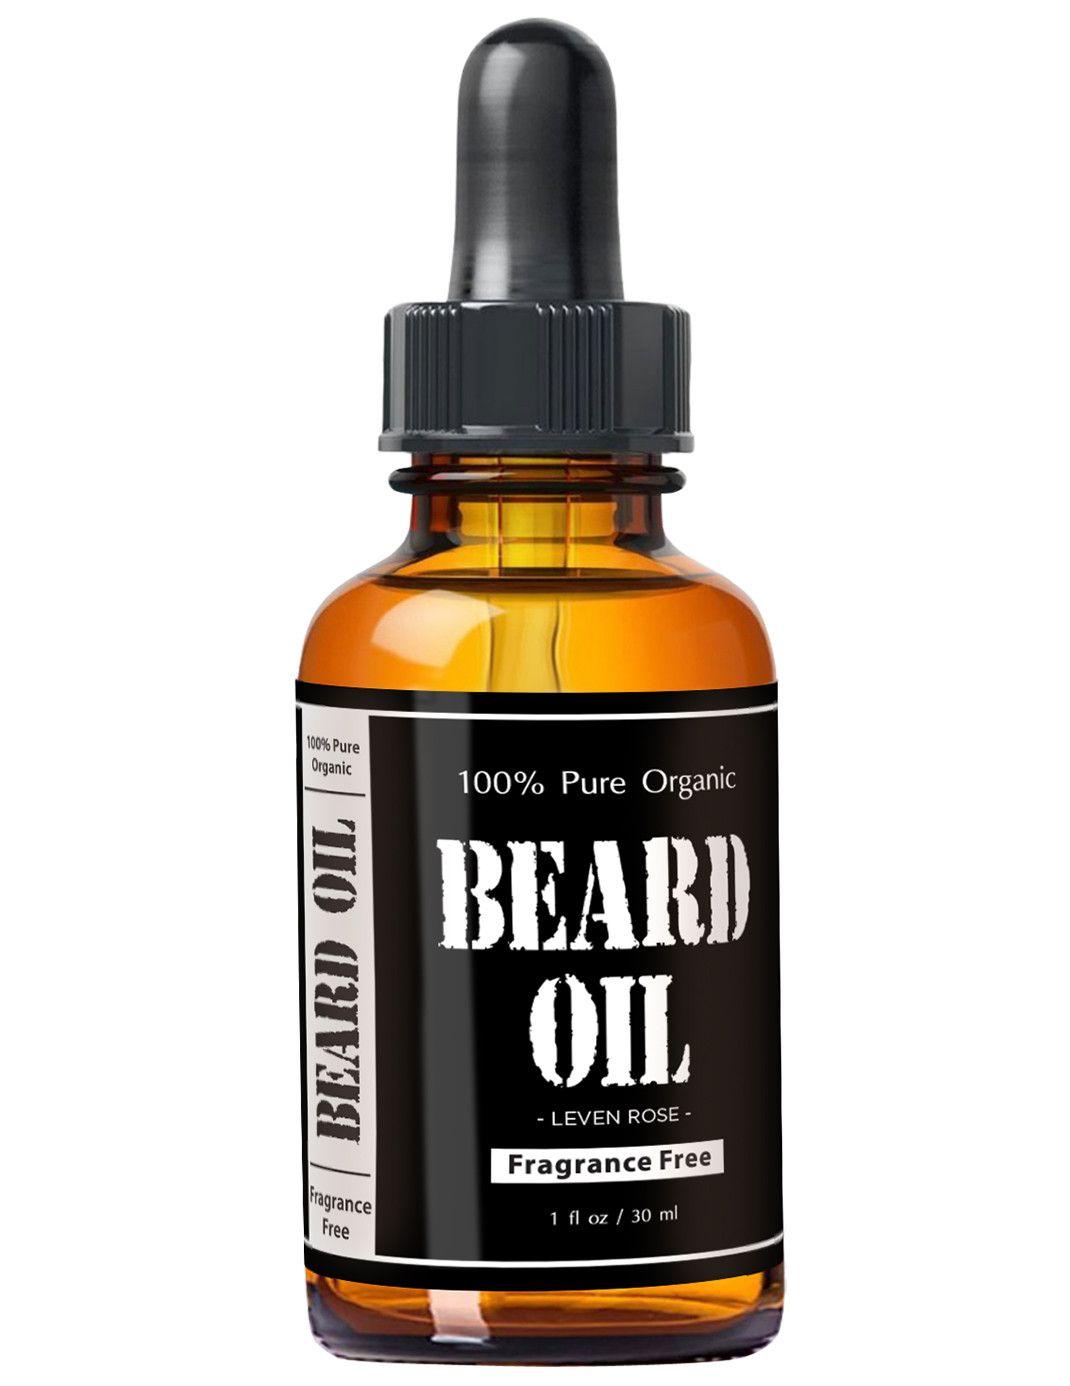 Beard Oil Fragrance Free 1 oz Saving for my hubs when